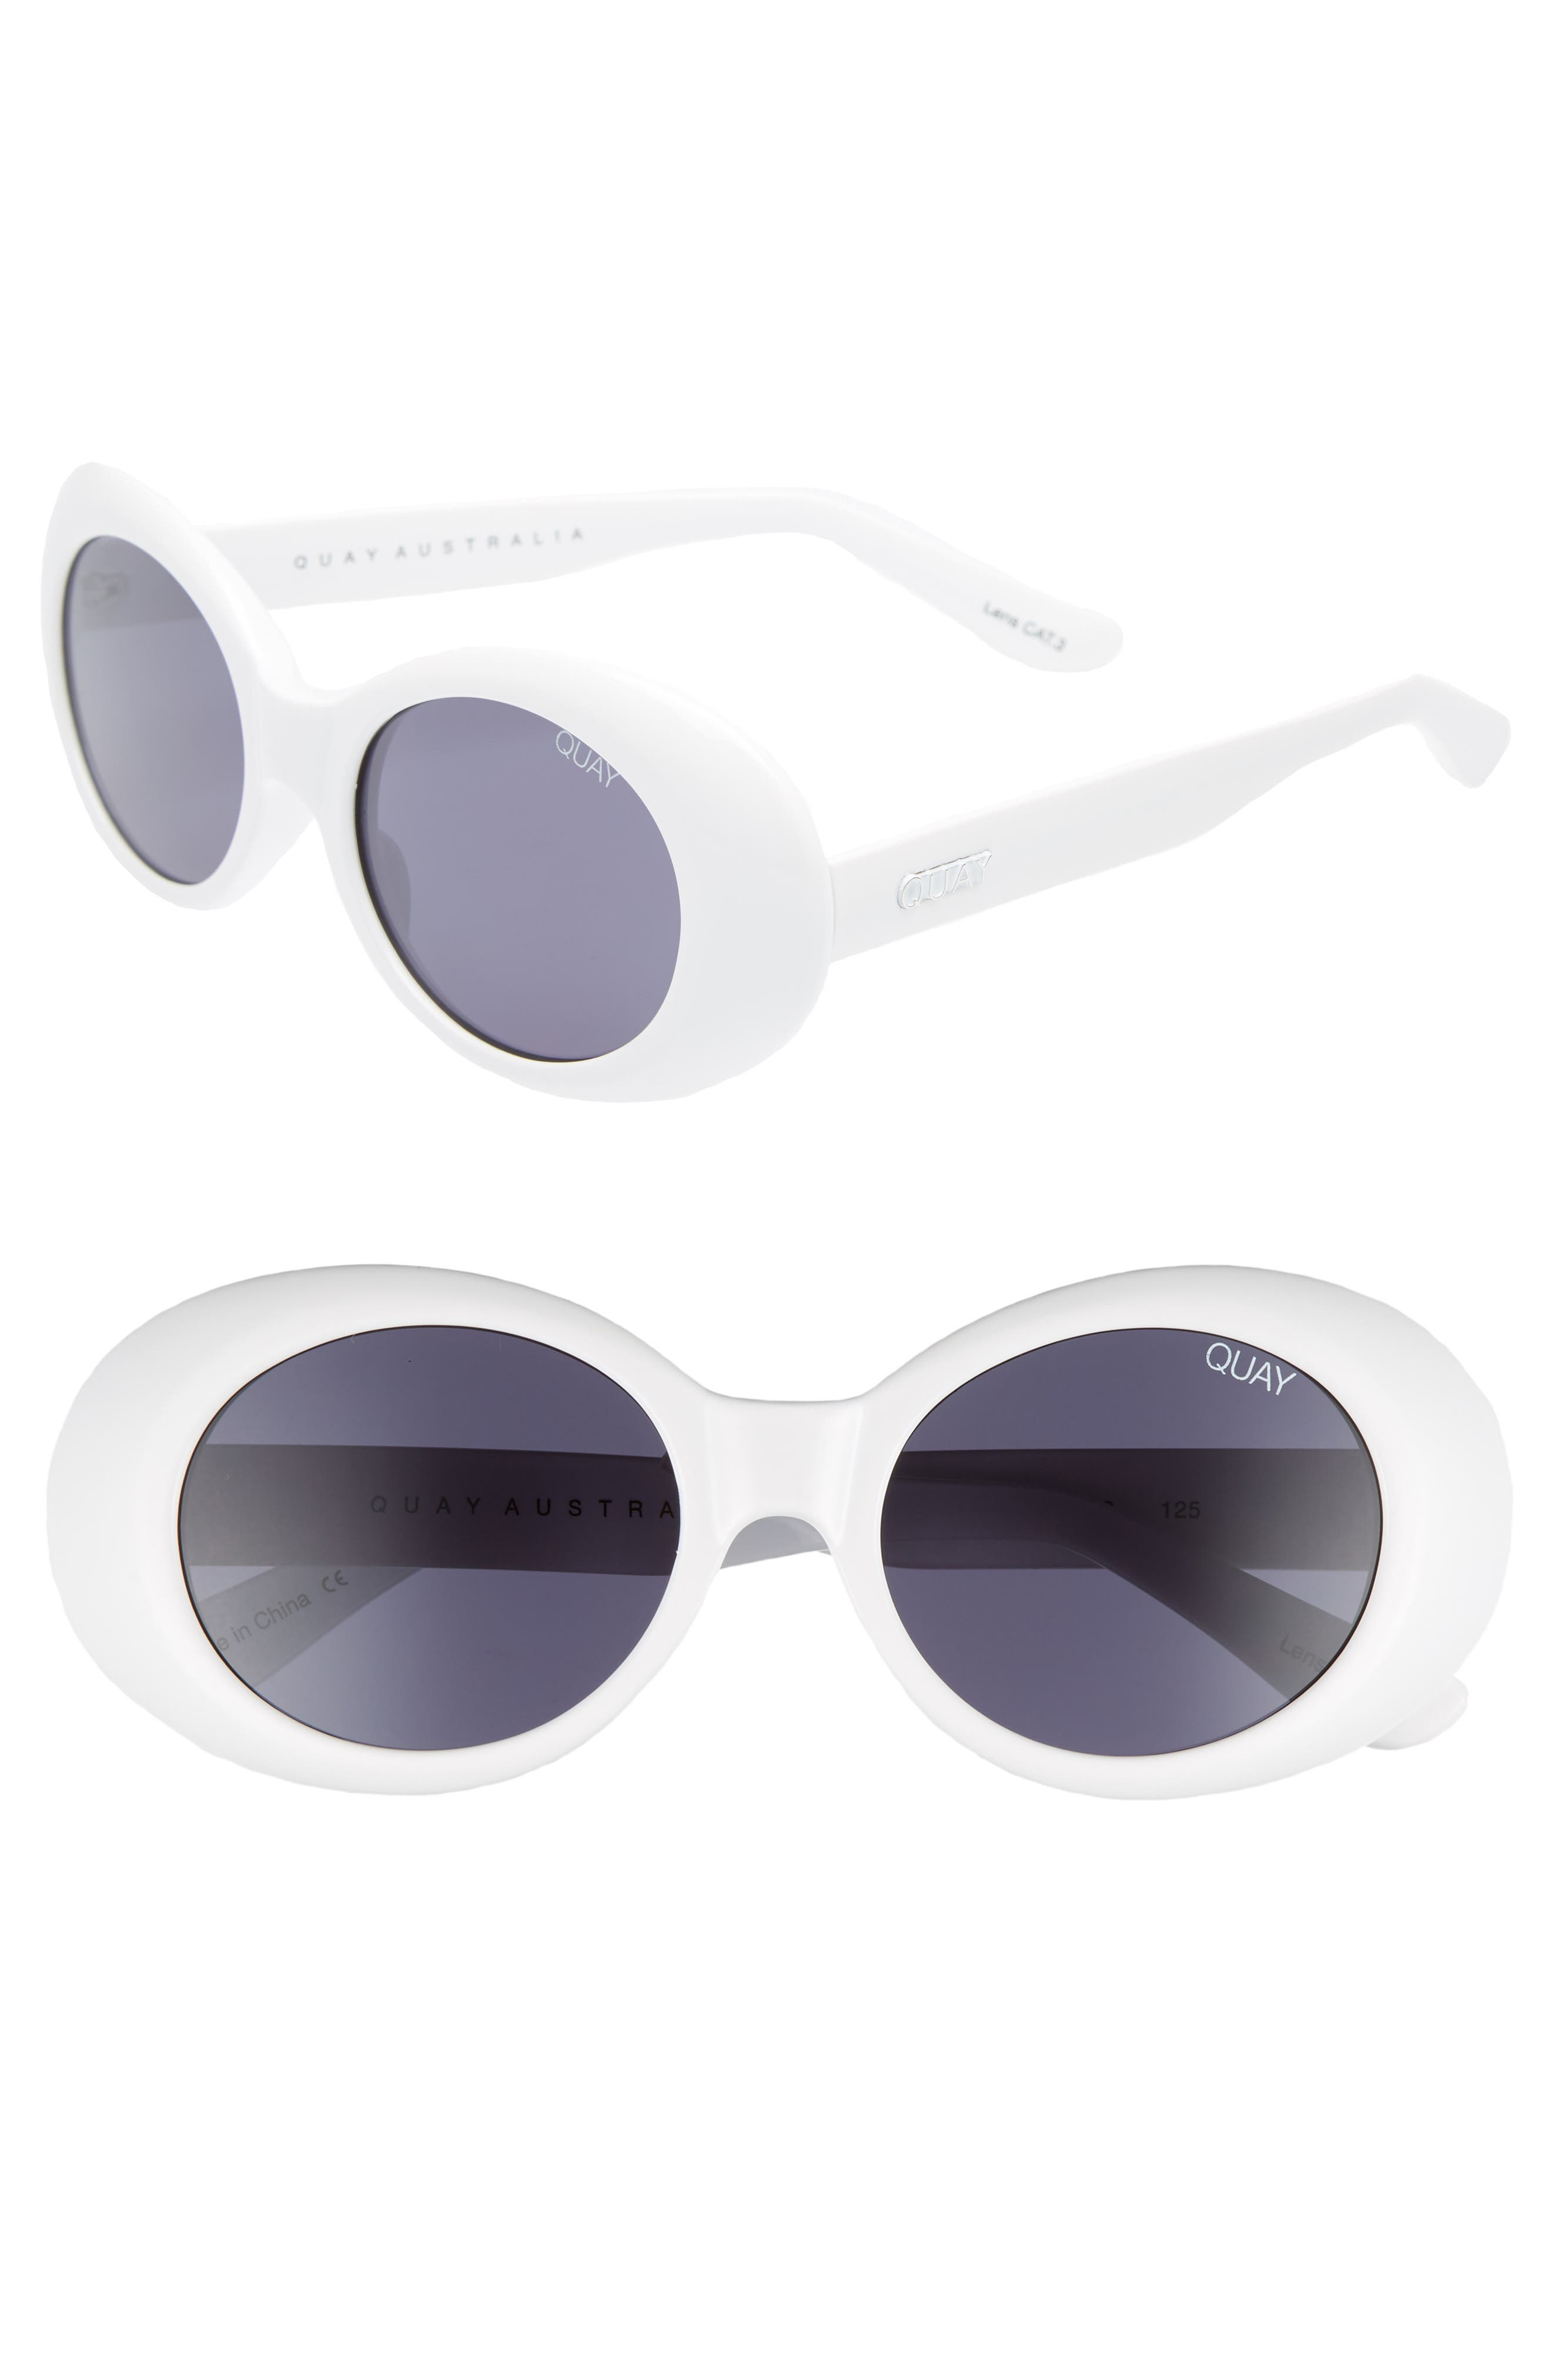 Frivolous 50mm Oval Sunglasses,                             Main thumbnail 1, color,                             100